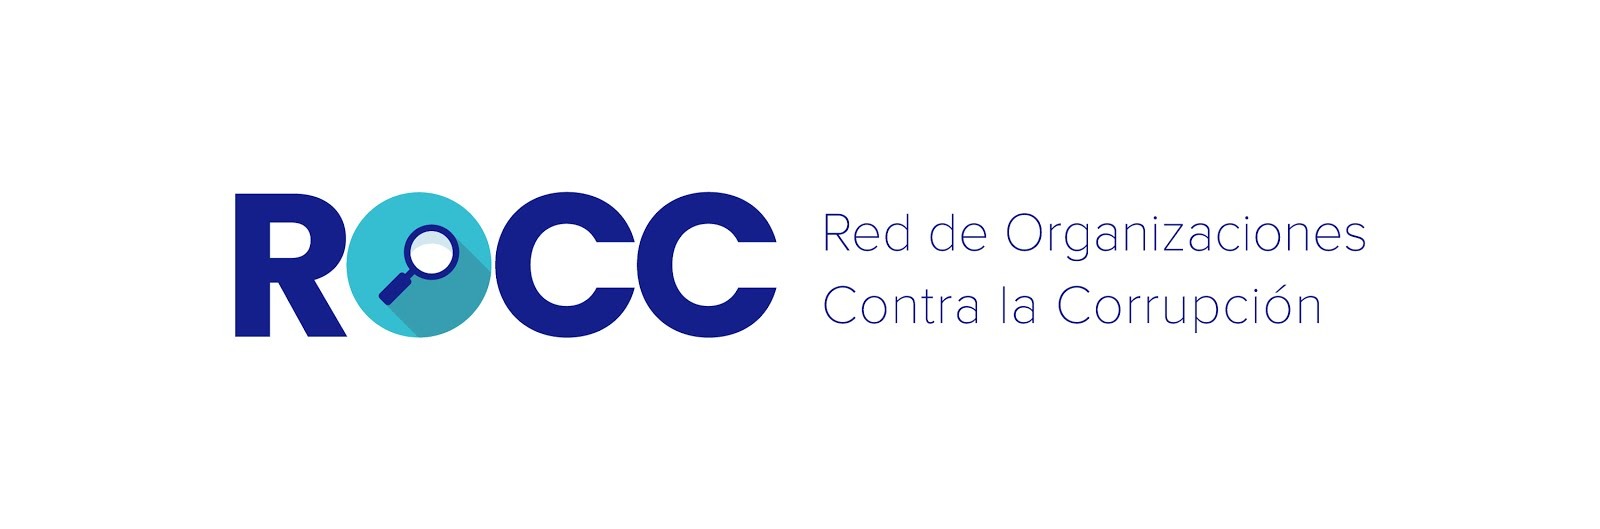 Salta Transparente integra la ROCC